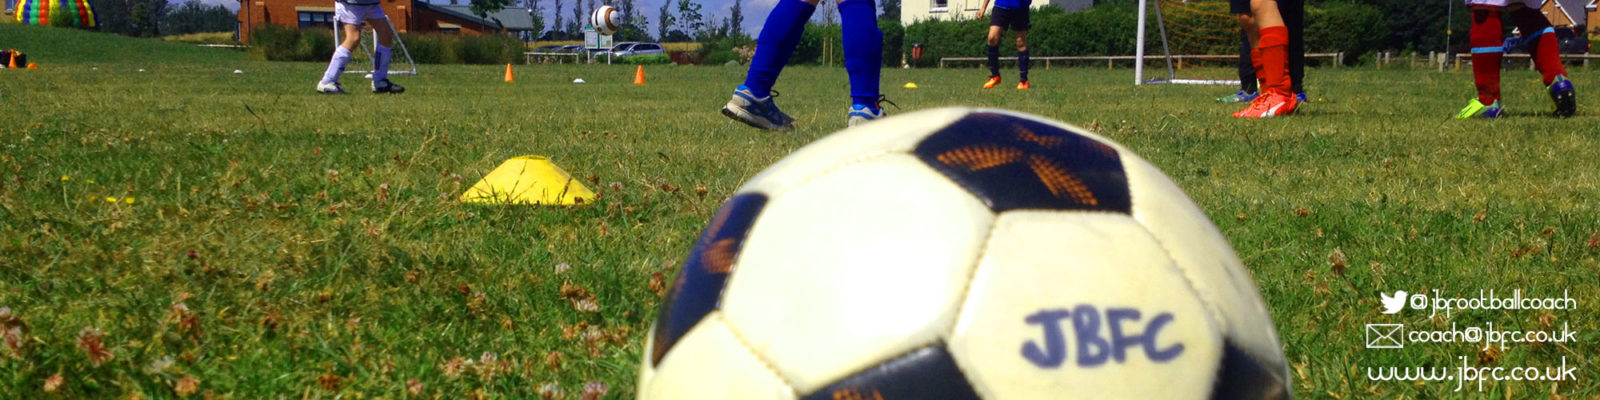 JBFC Jamie Bradbury kids football coaching school holiday football camps